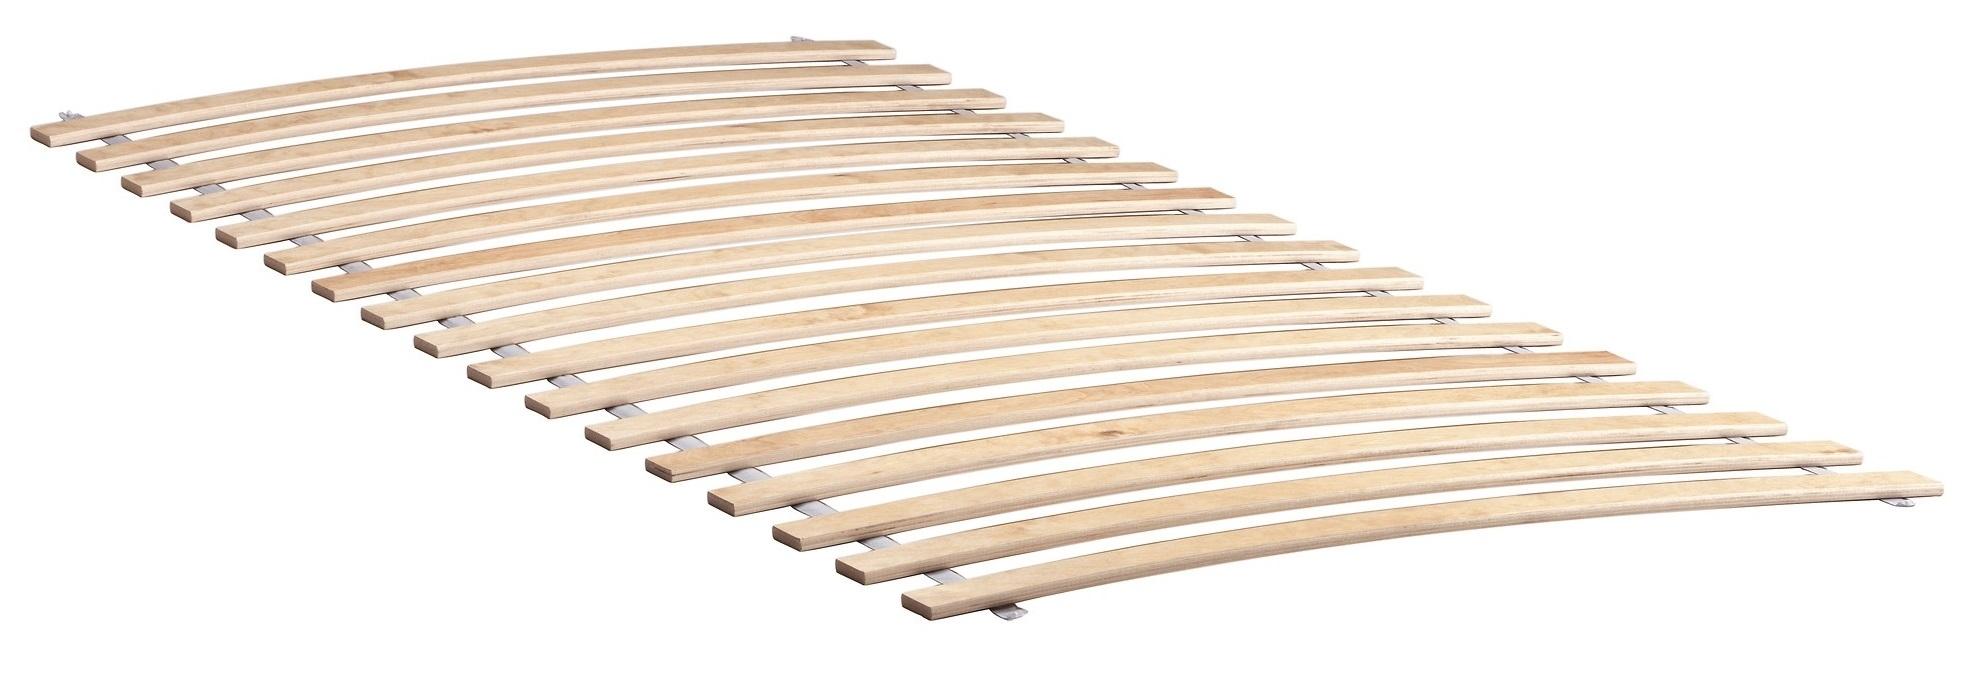 Lattenbodem FD van 90x200cm | FD Furniture